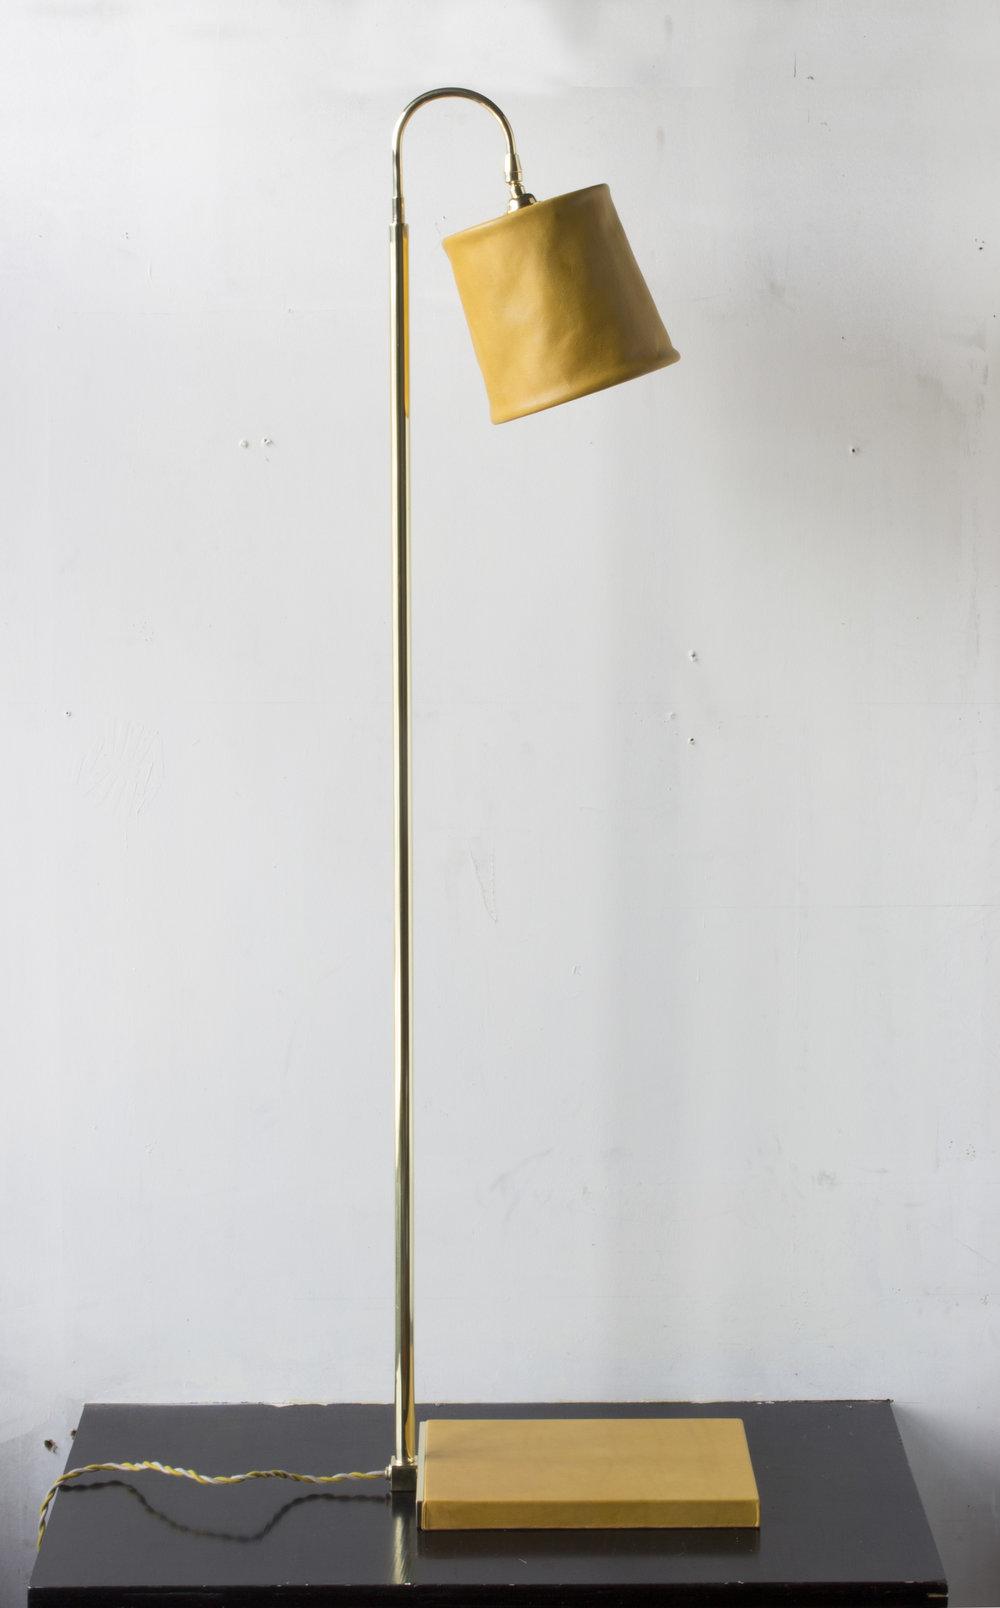 Amazing SERIES 01 FLOOR LAMP   MUSTARD   POLISHED UNLACQUERED BRASS